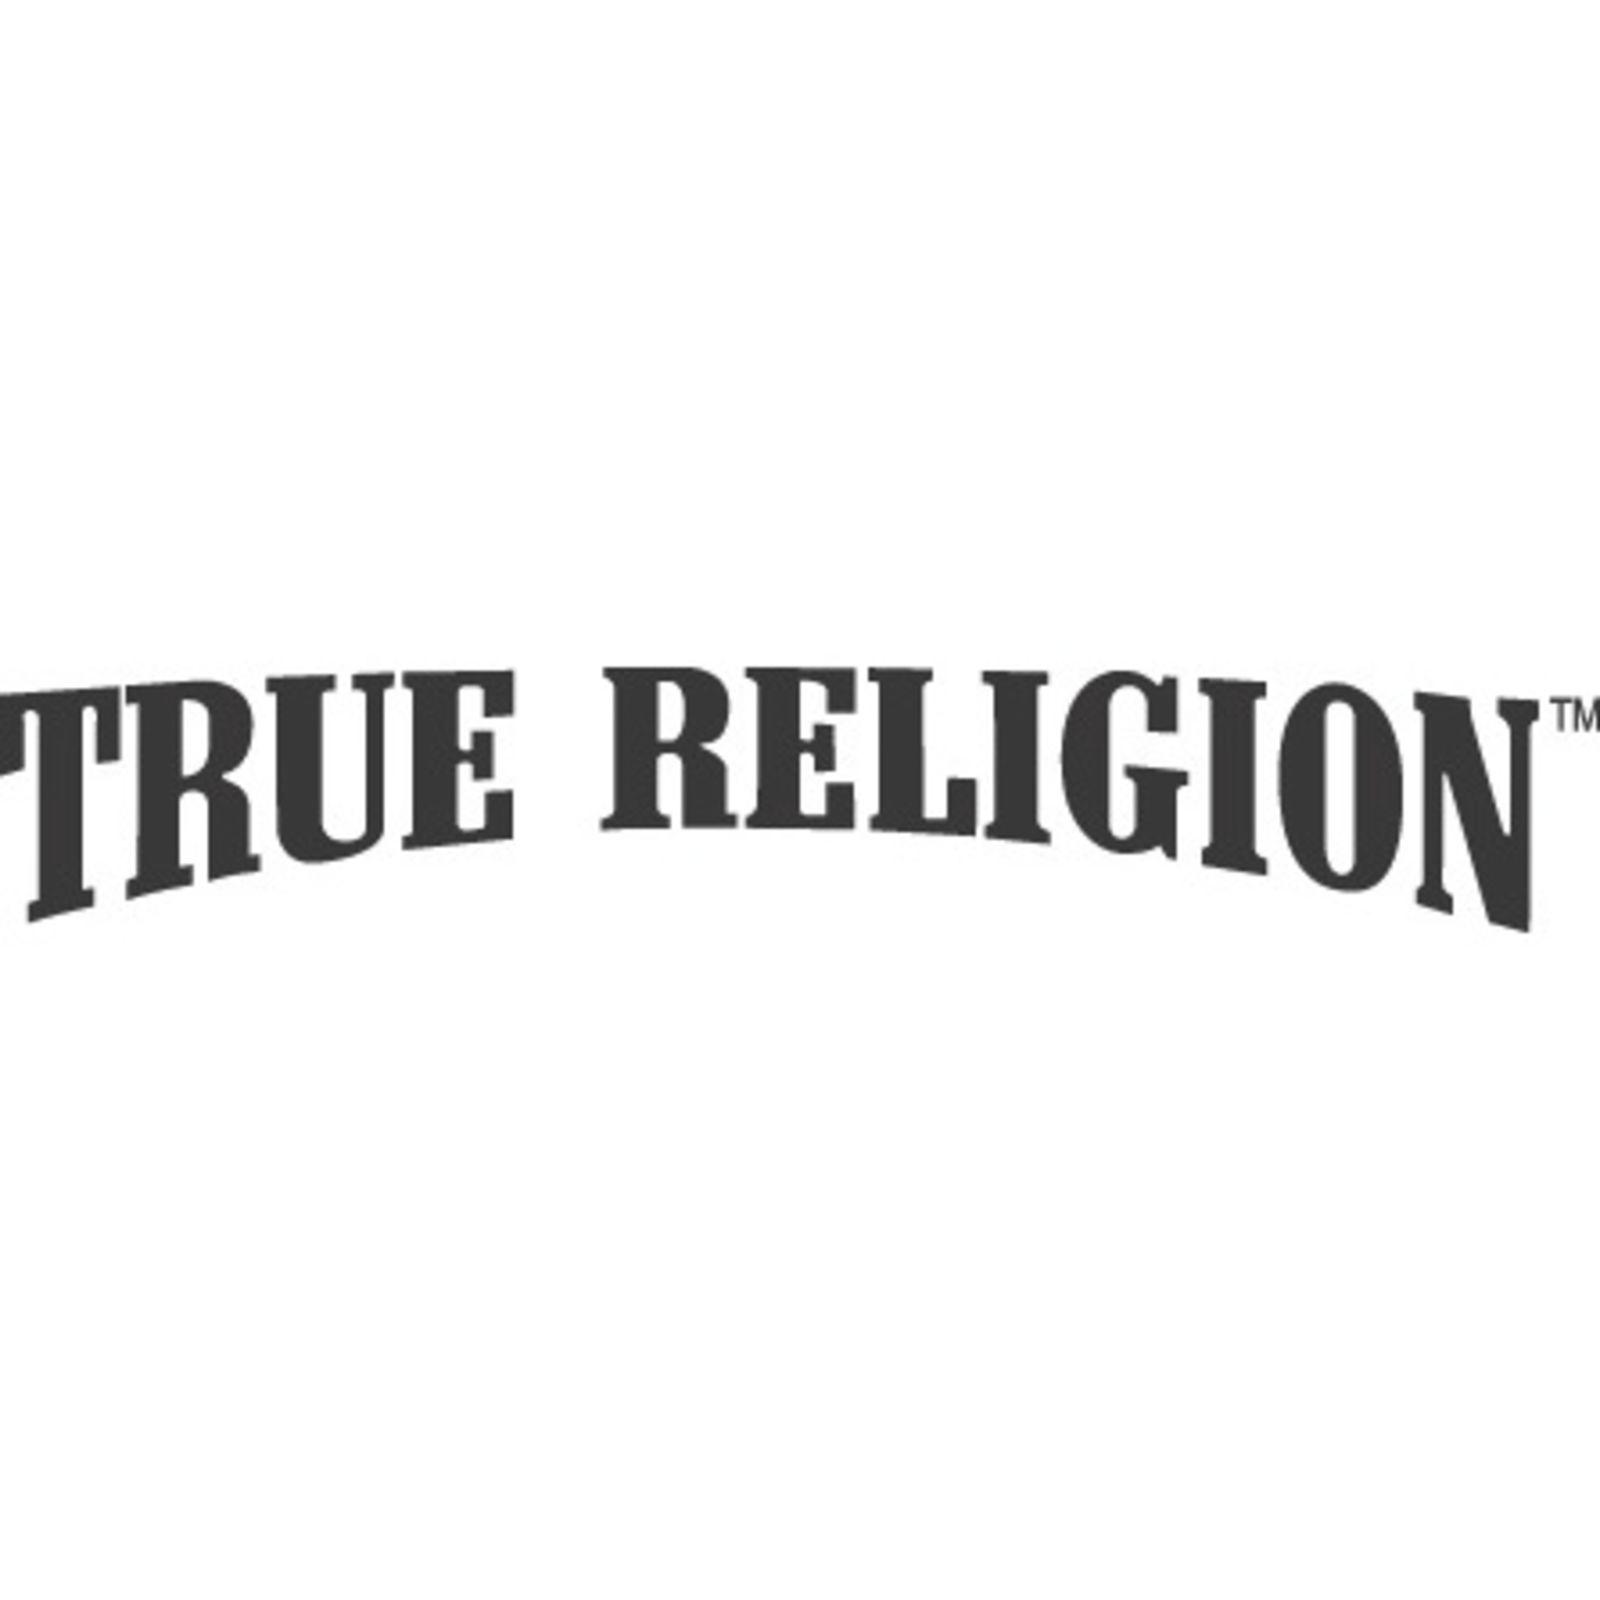 TRUE RELIGION (Bild 1)